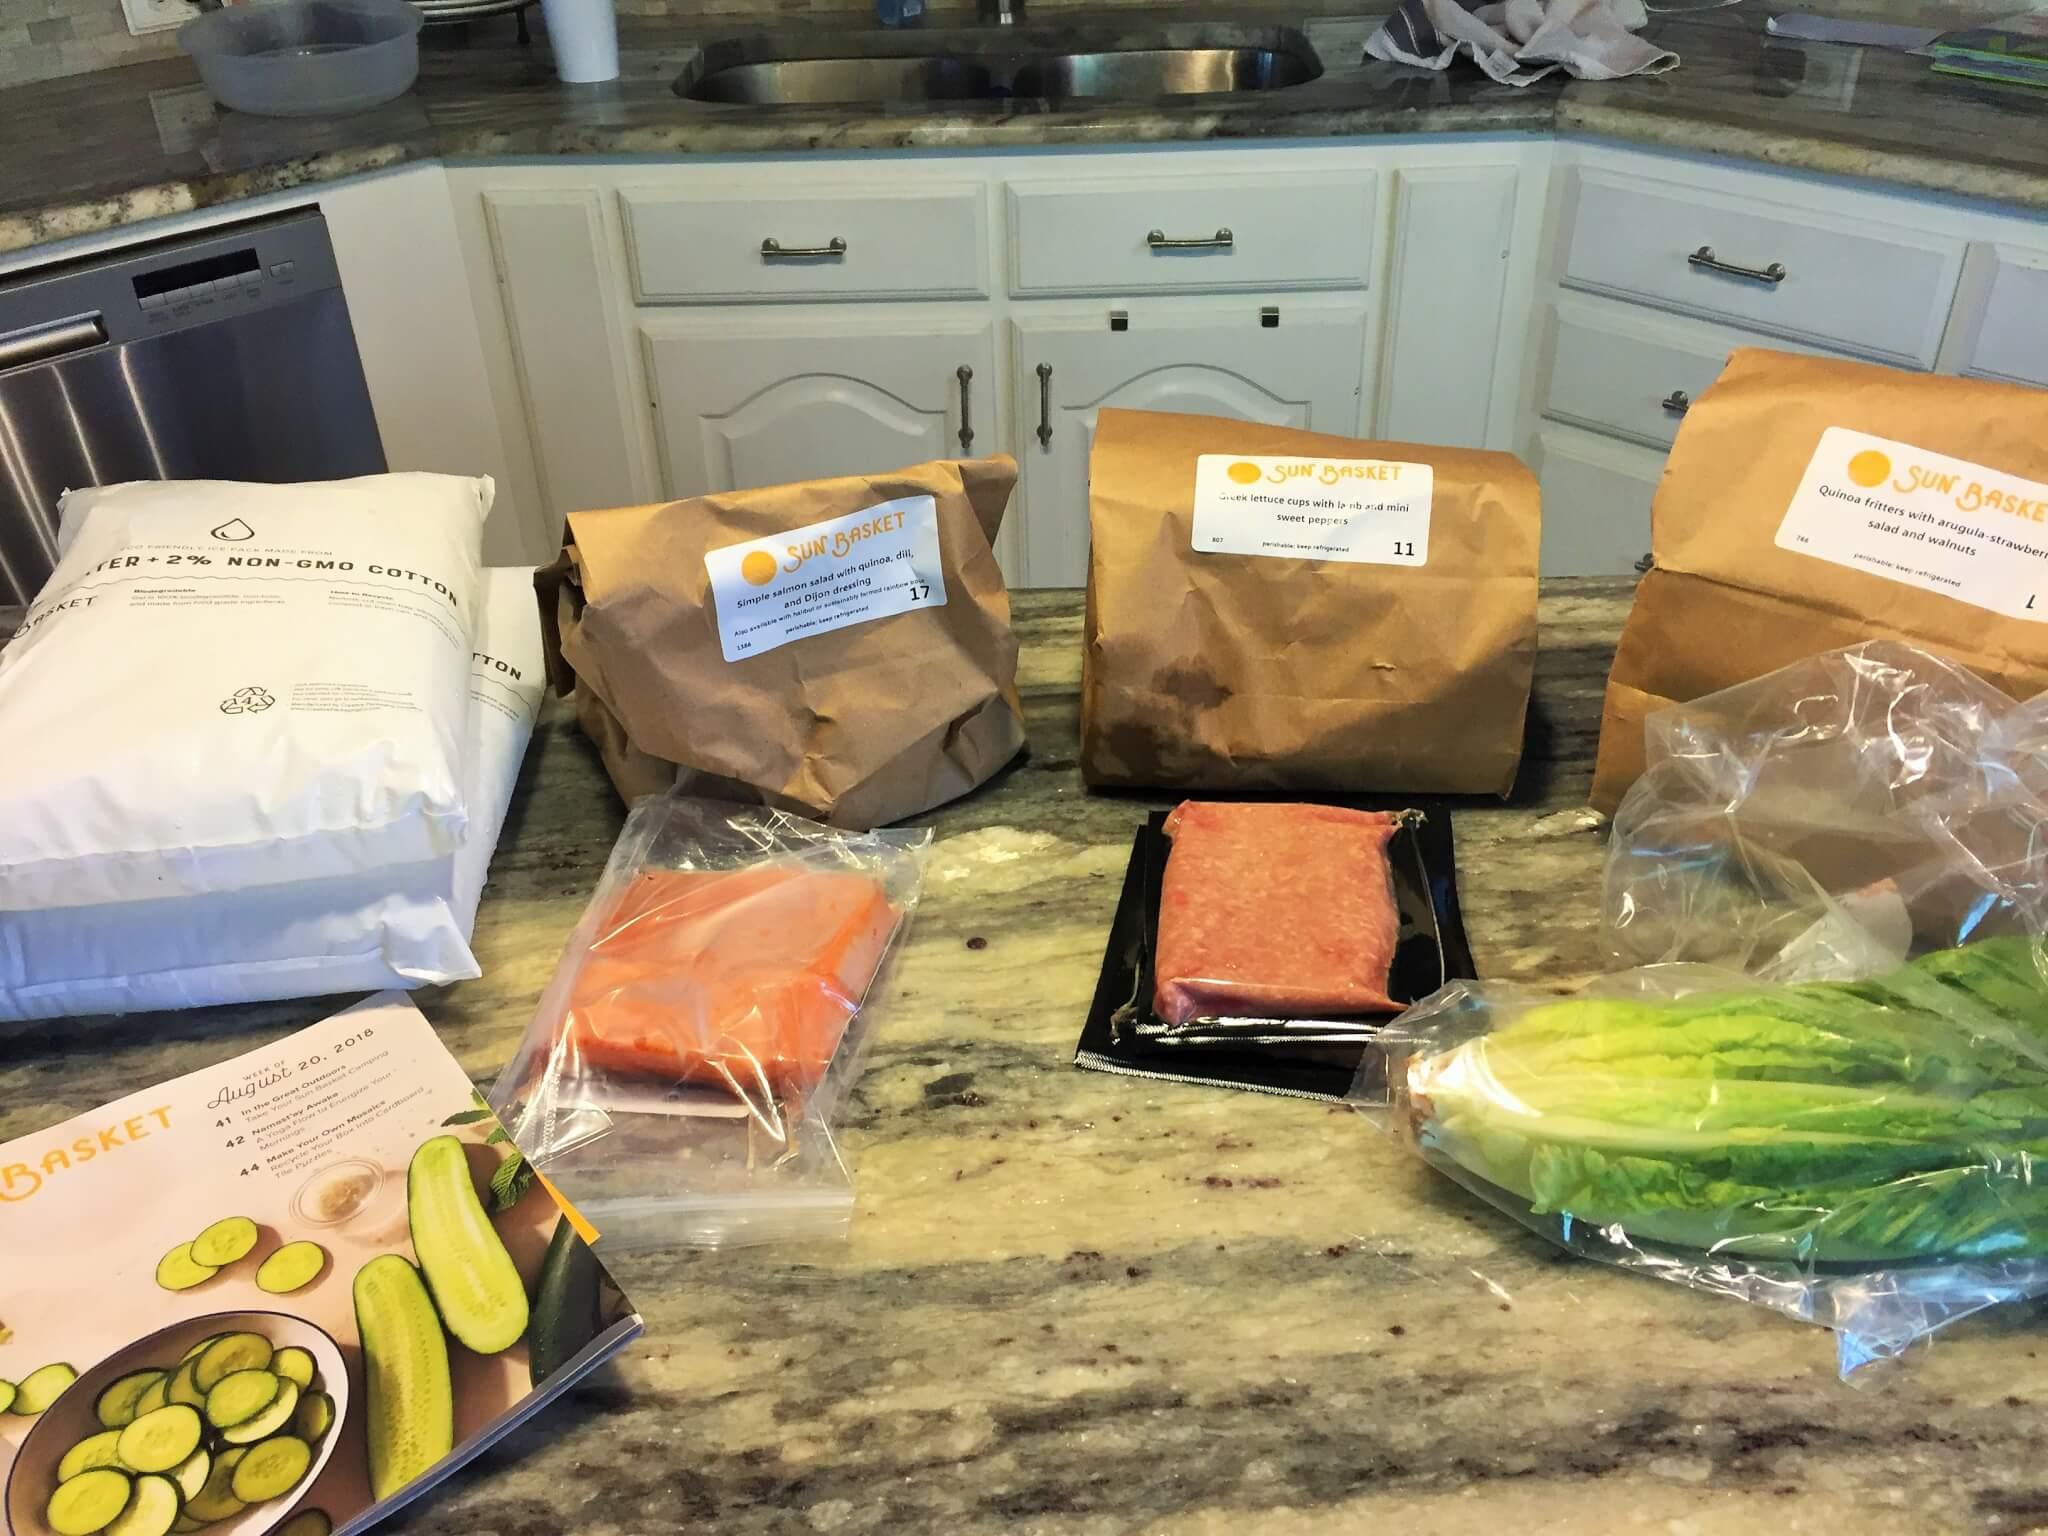 Sun Basket meal kit contents.